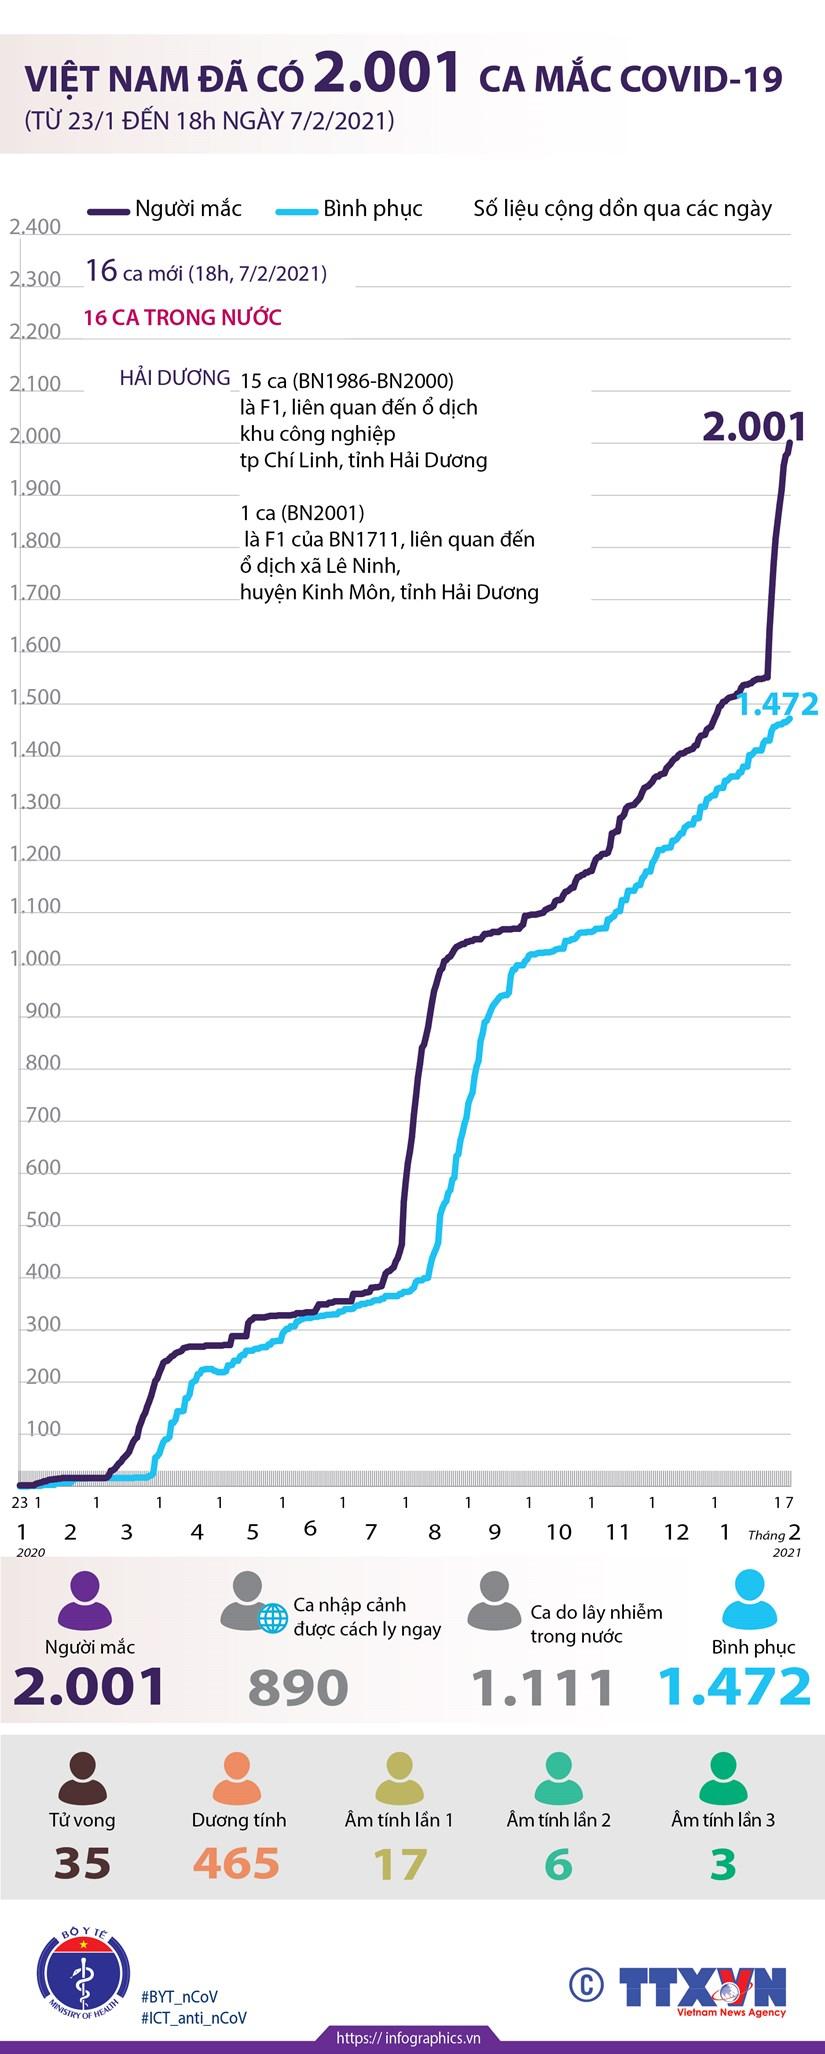 [Infographics] Viet Nam da co 2.001 ca mac dich benh COVID-19 hinh anh 1